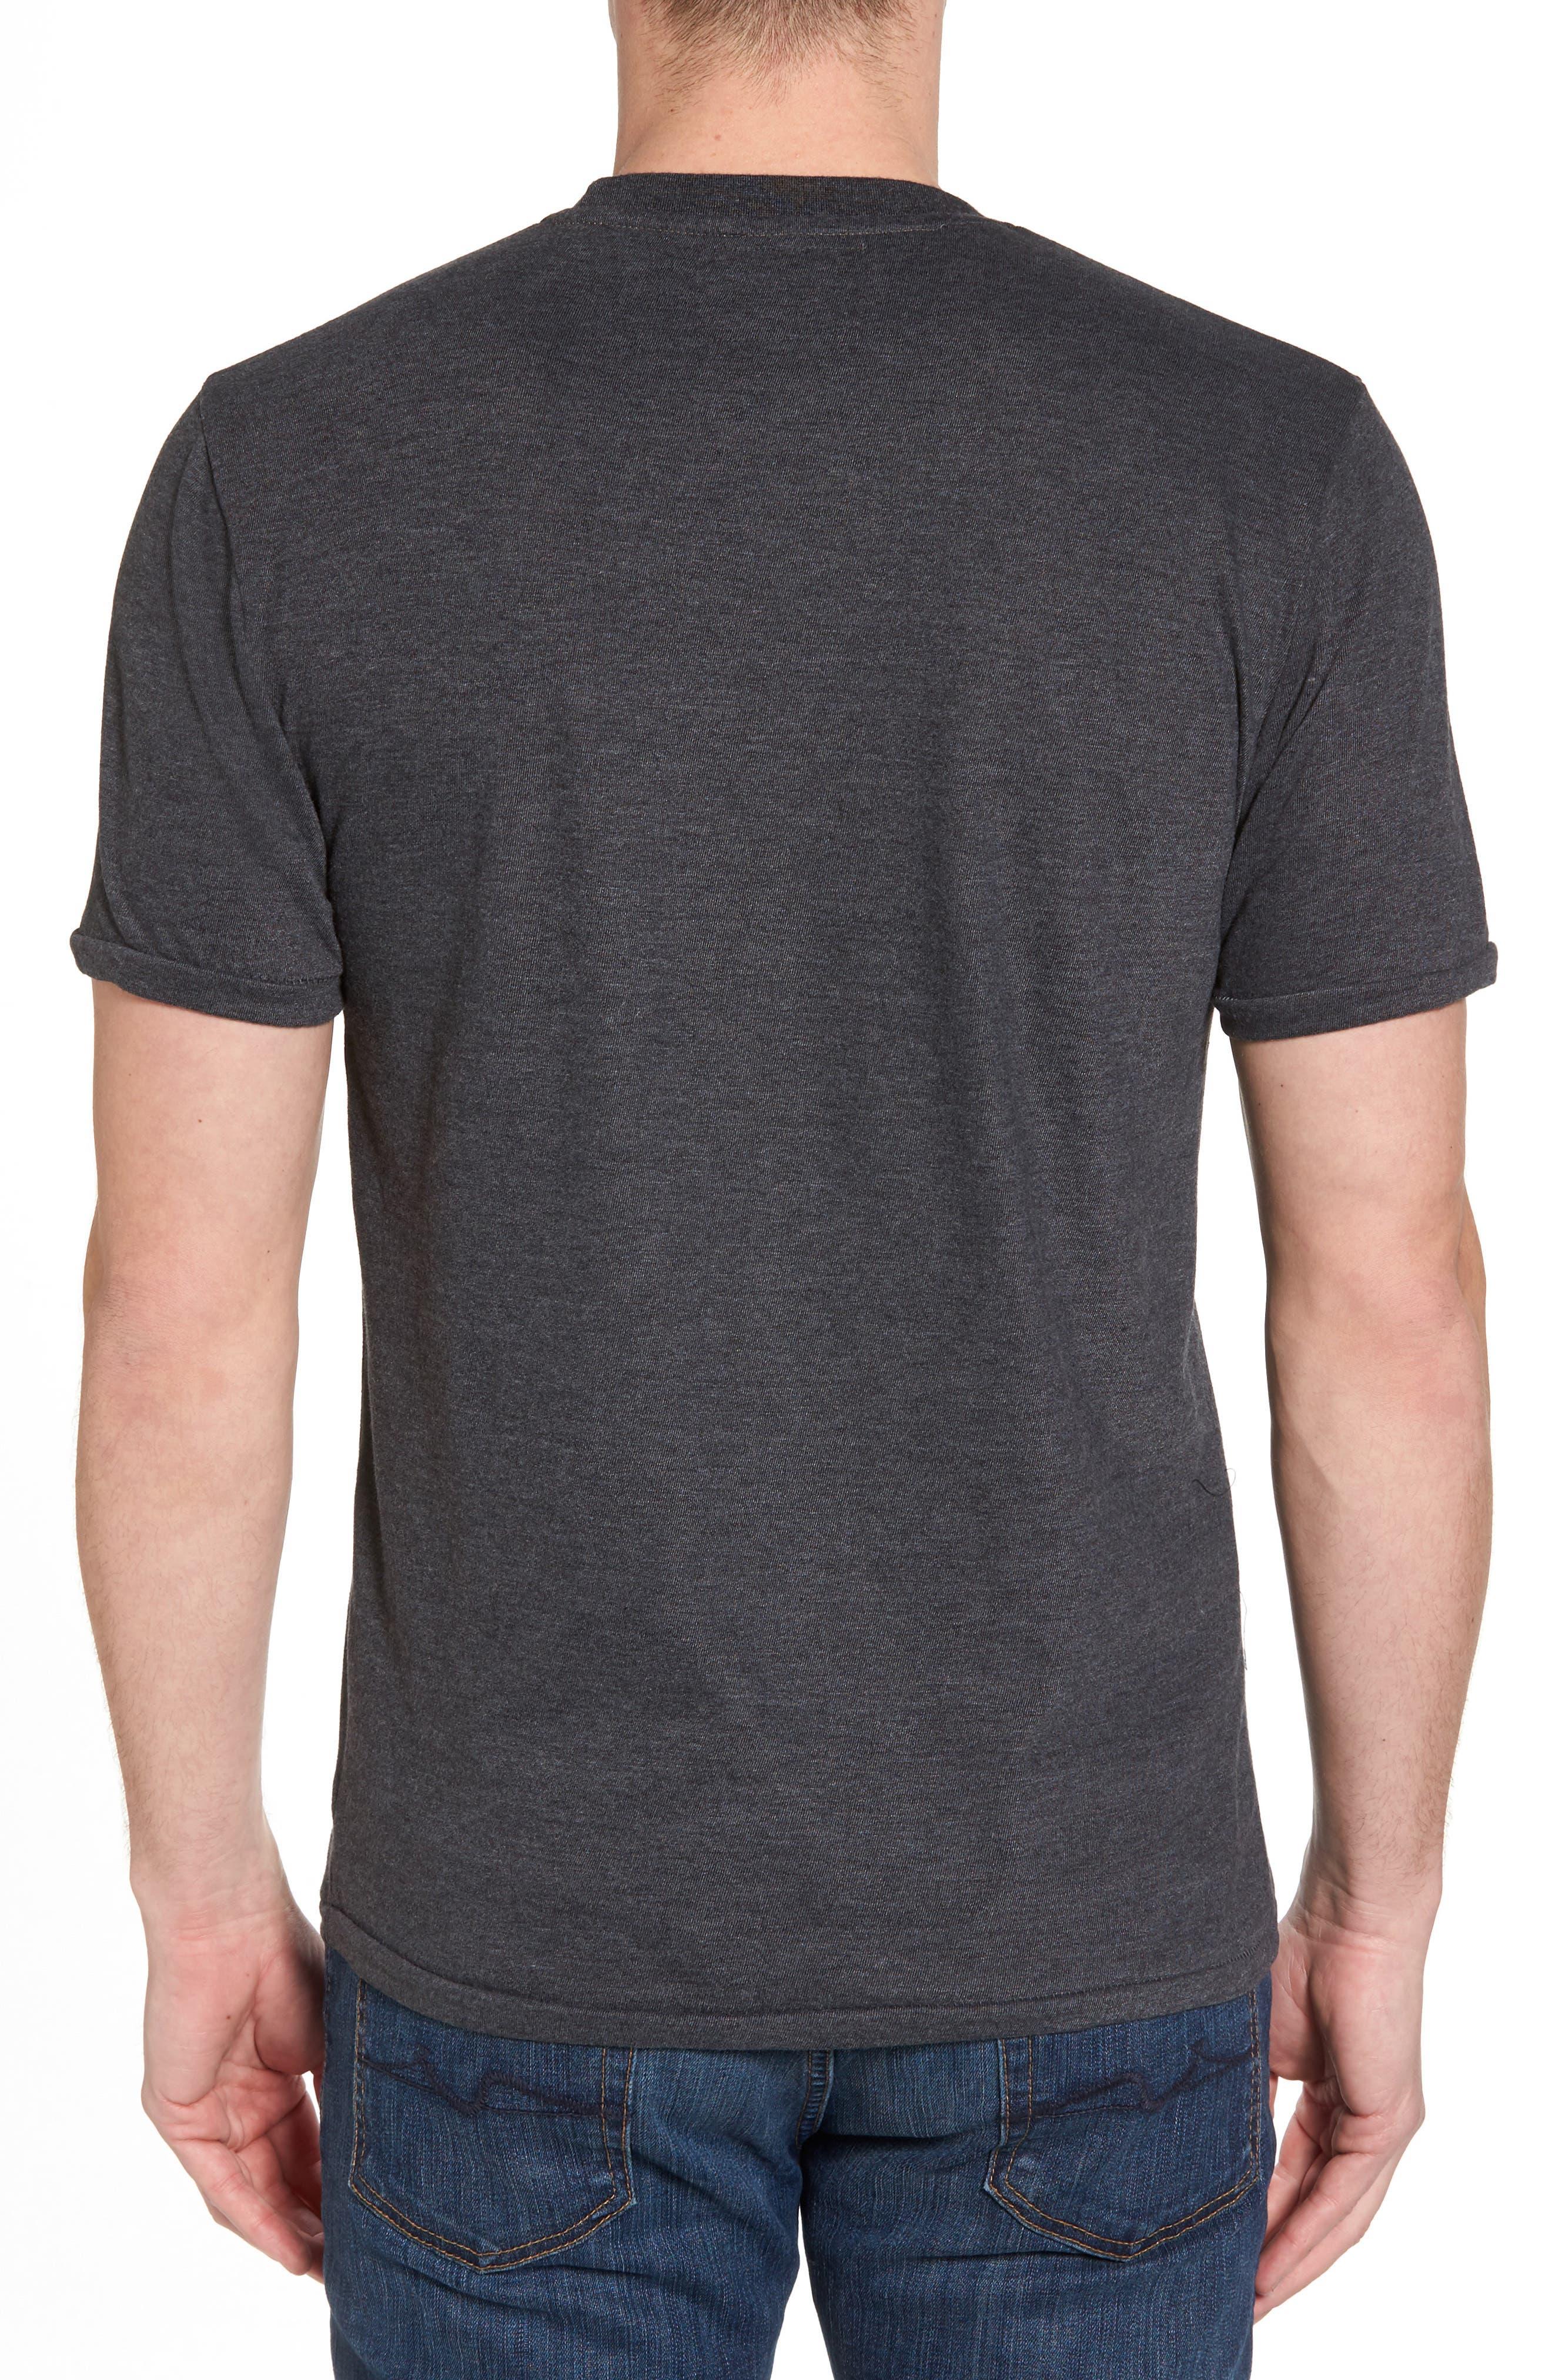 Hillwood Bruins T-Shirt,                             Alternate thumbnail 2, color,                             Heather Black